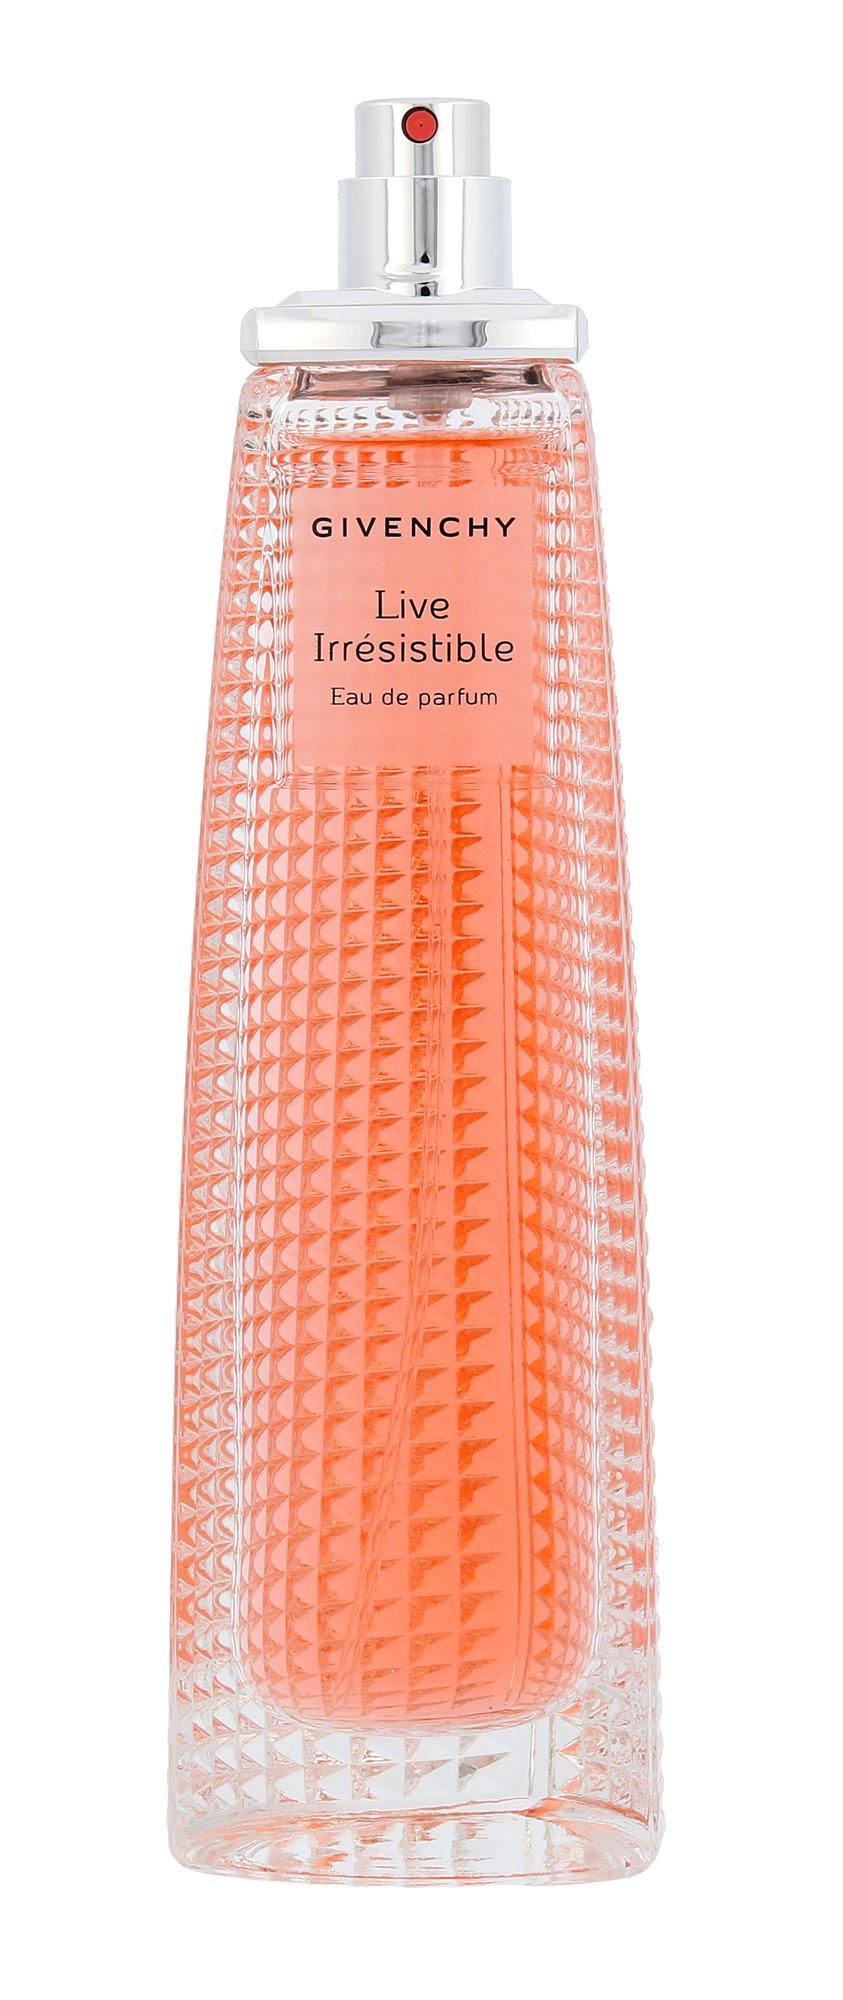 Givenchy Live Irresistible, Parfumovaná voda 75ml, Tester